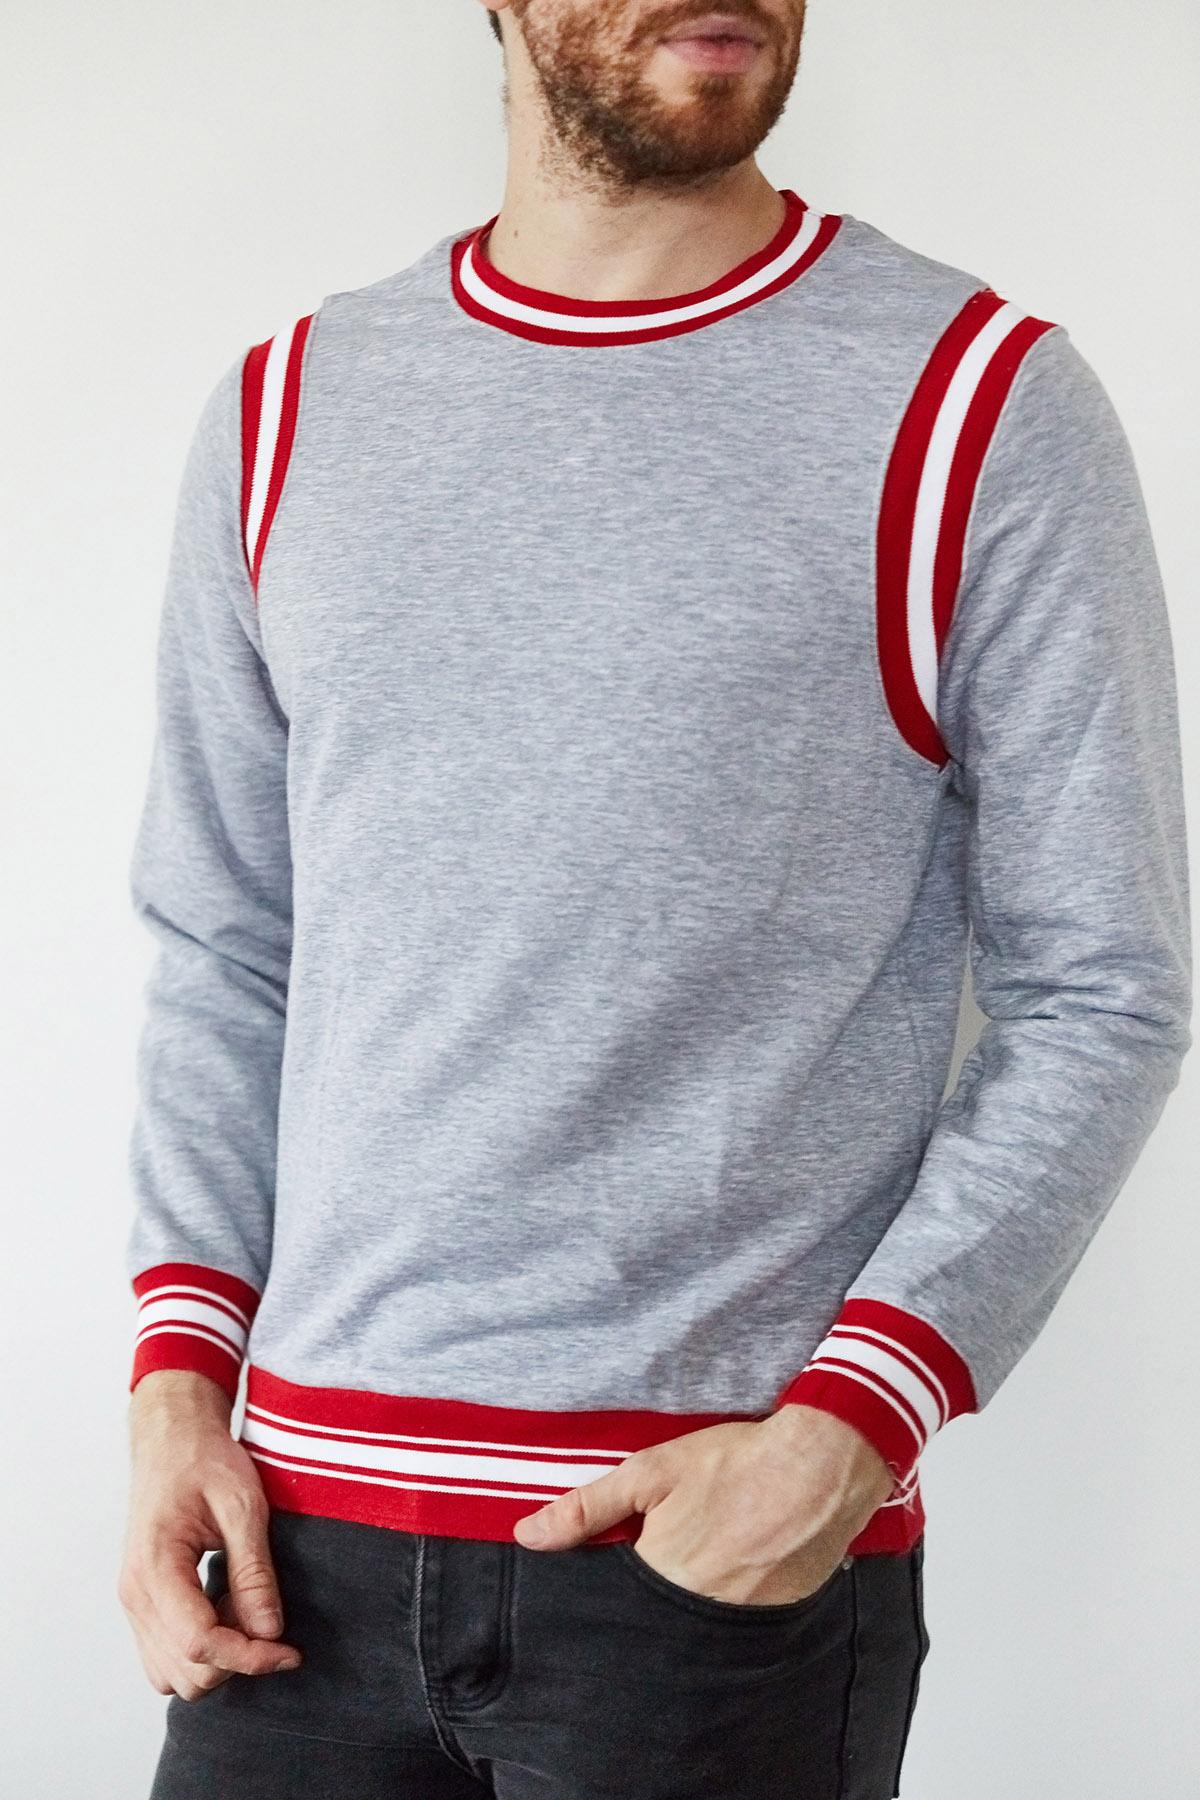 XHAN - Gri & Kırmızı Şeritli Bisiklet Yaka Sweatshirt 1KXE8-44164-03